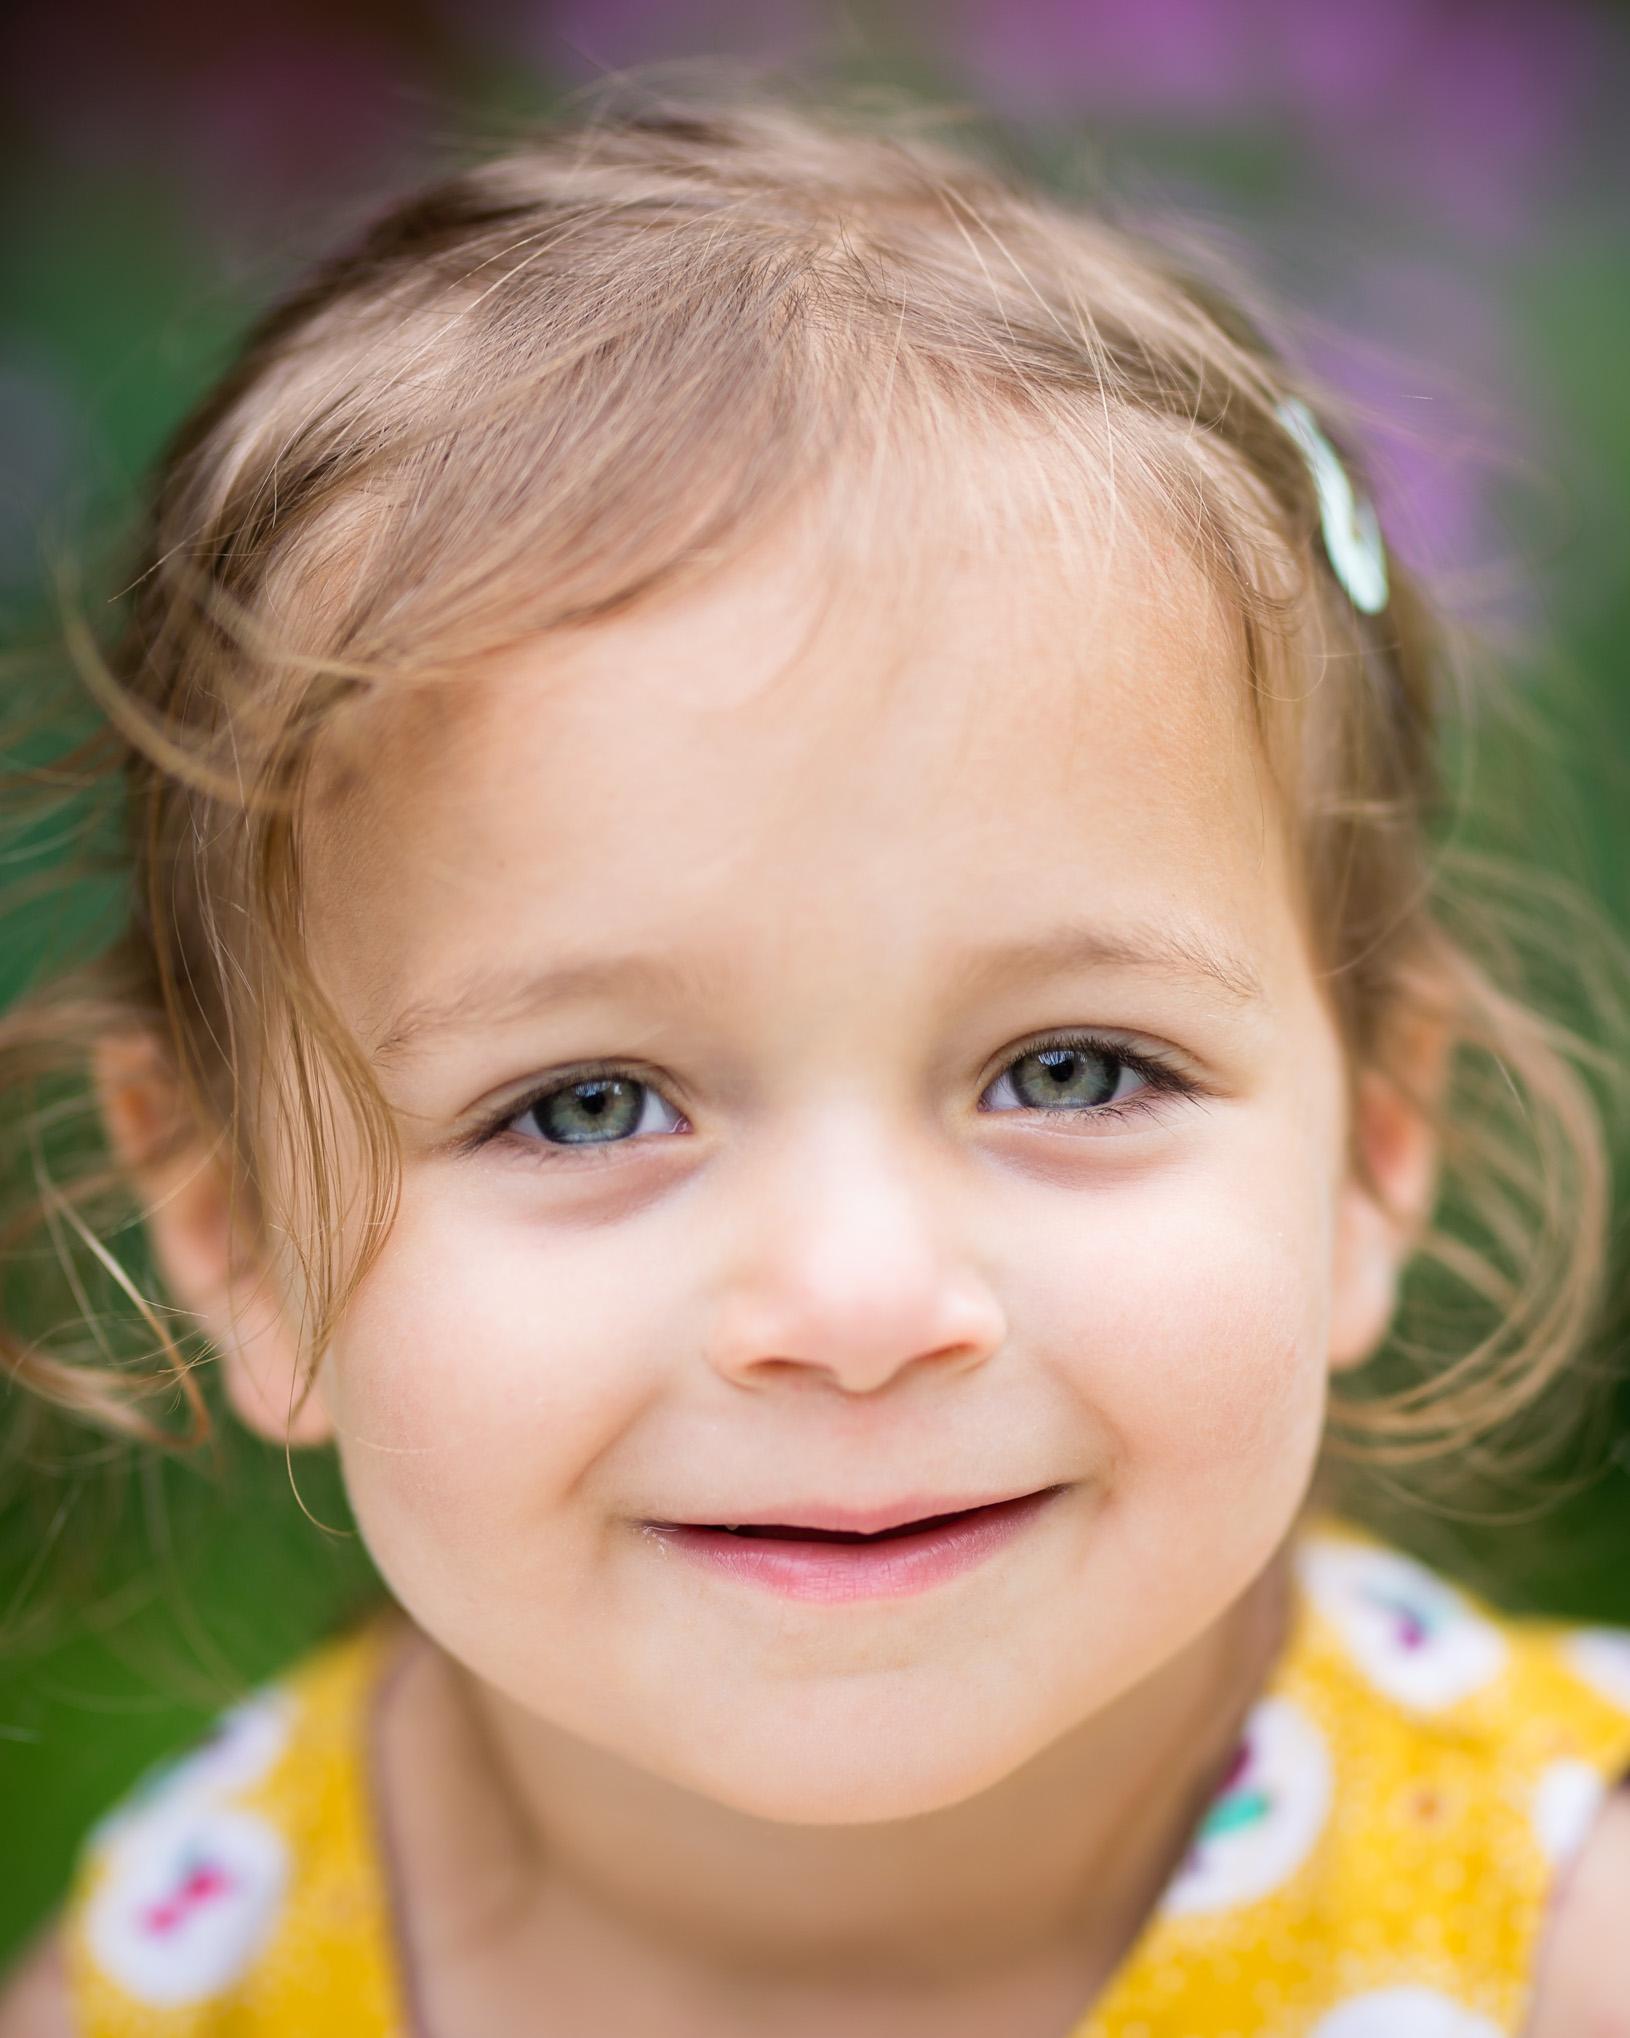 Toddler close up headshot | Children's Photography